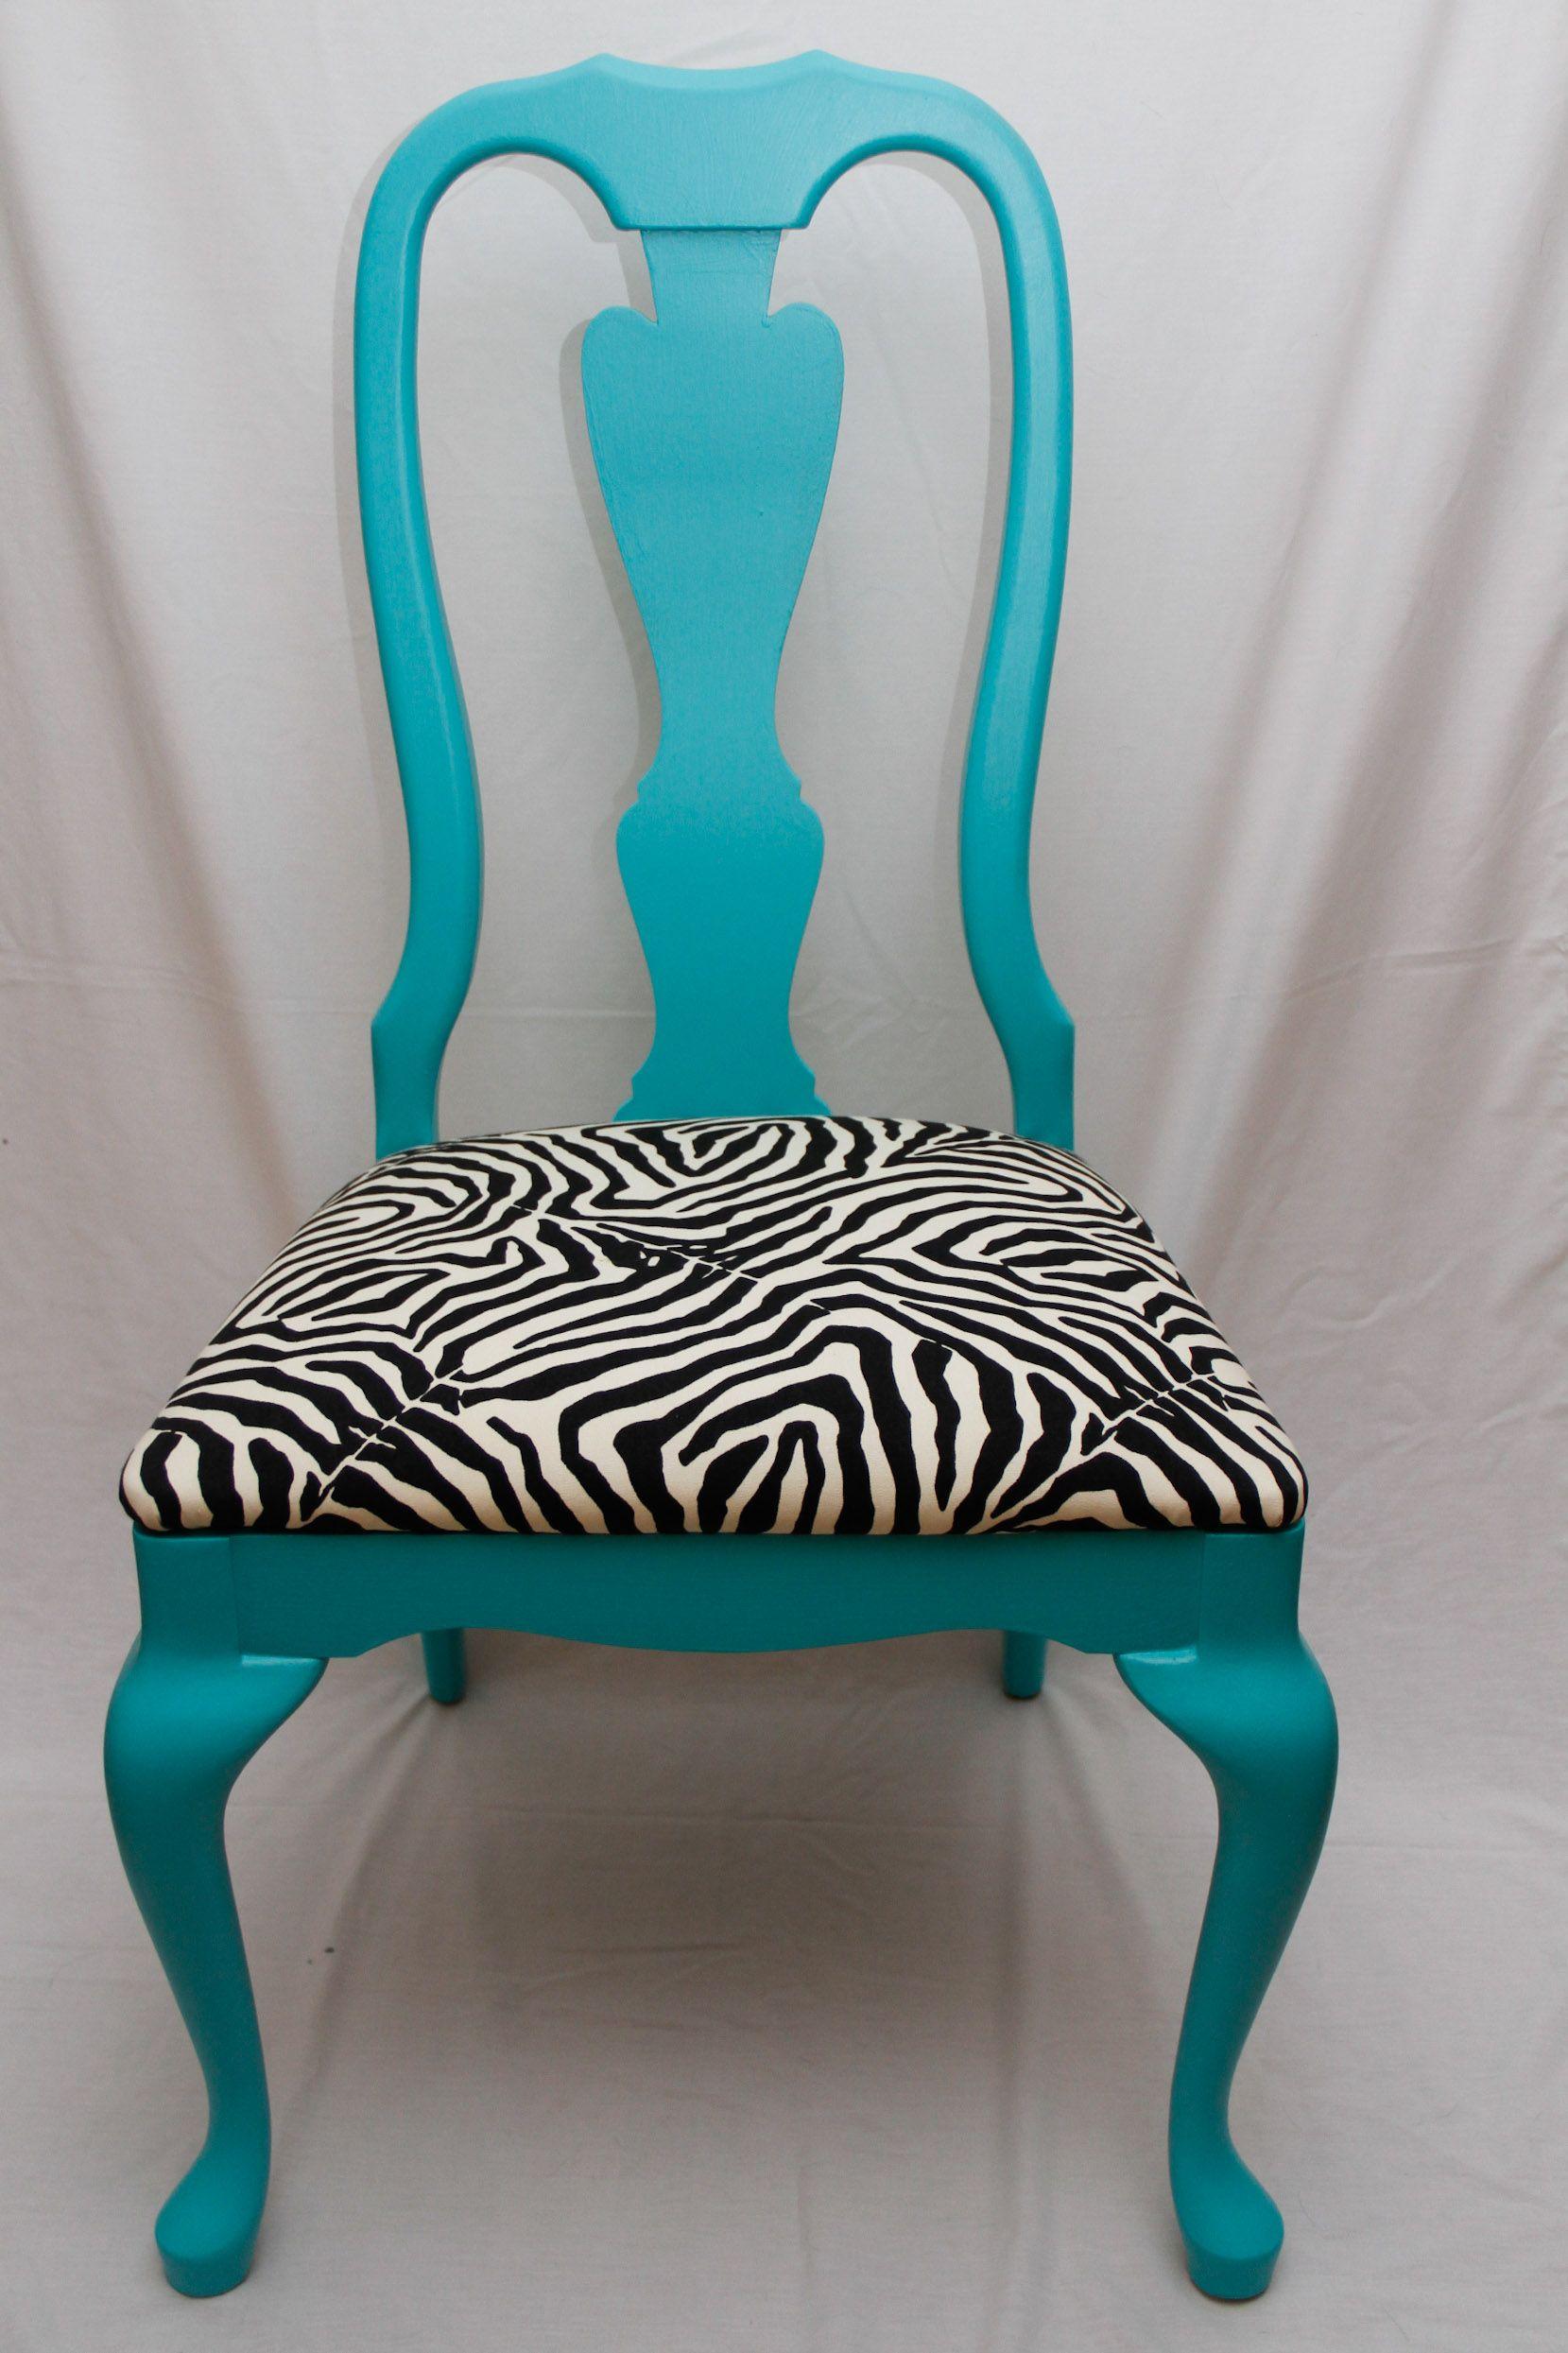 chair for desk in bedroom